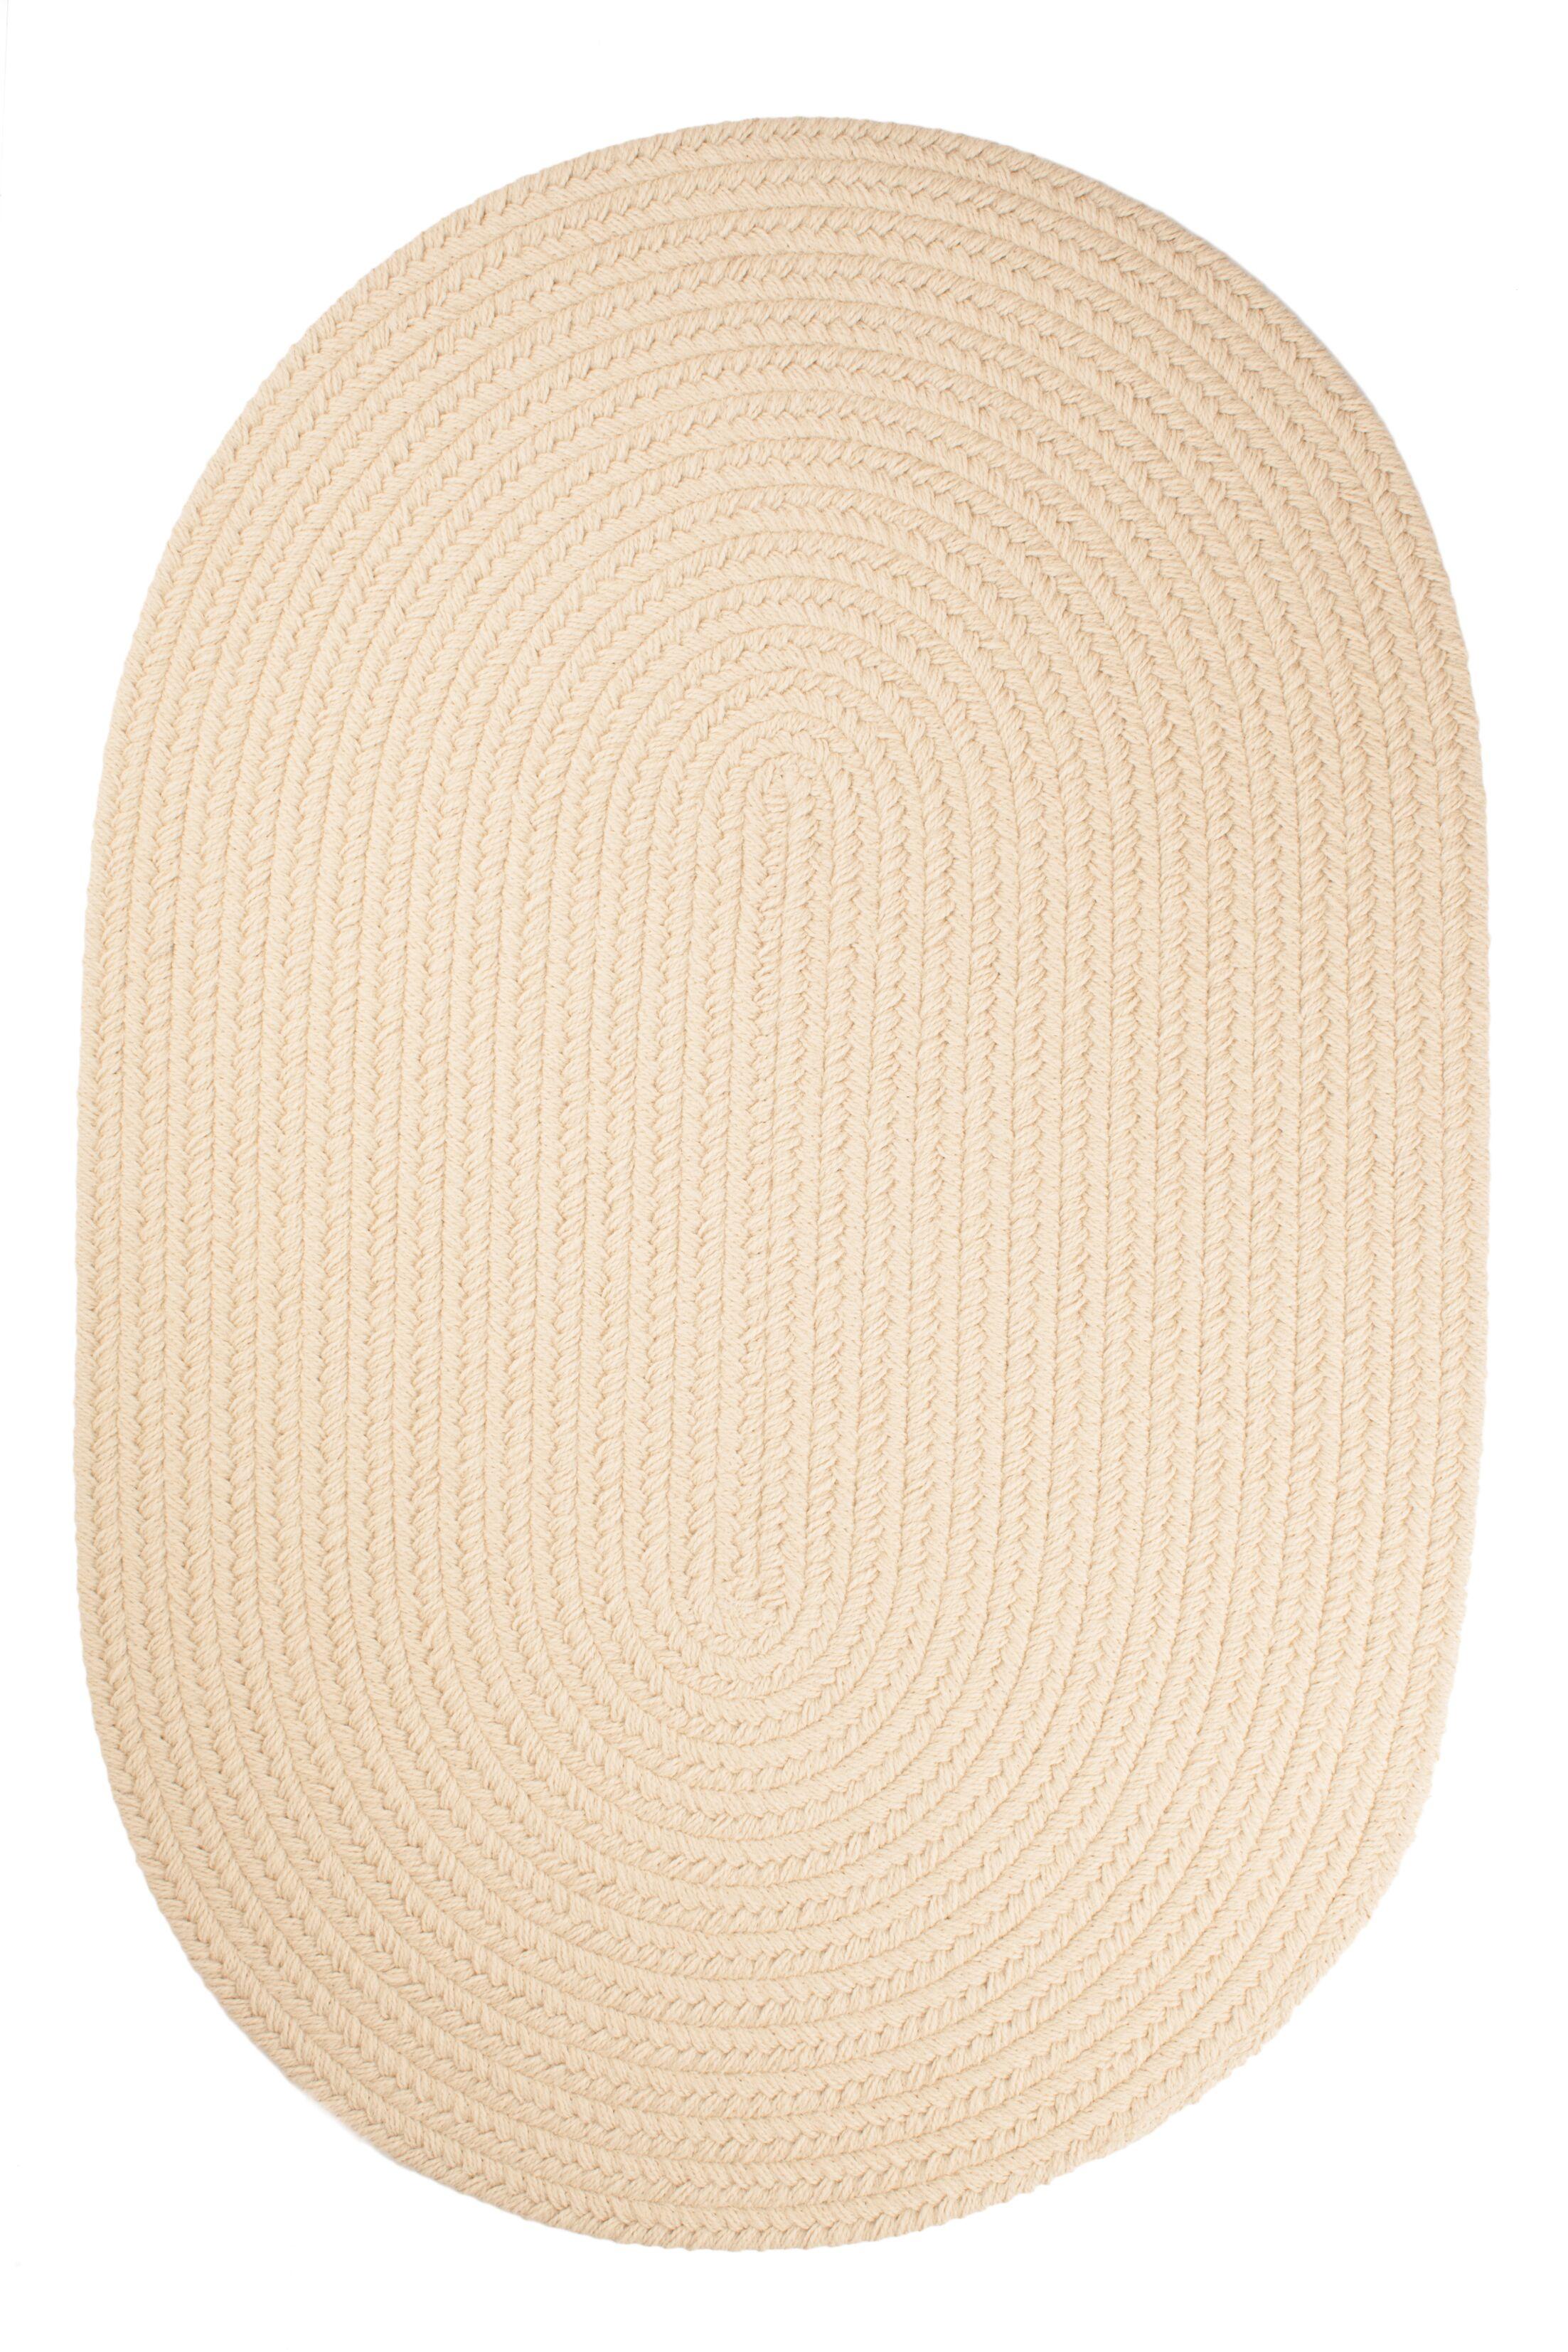 Handmade Cream Indoor/Outdoor Area Rug Rug Size: Oval 4' x 6'